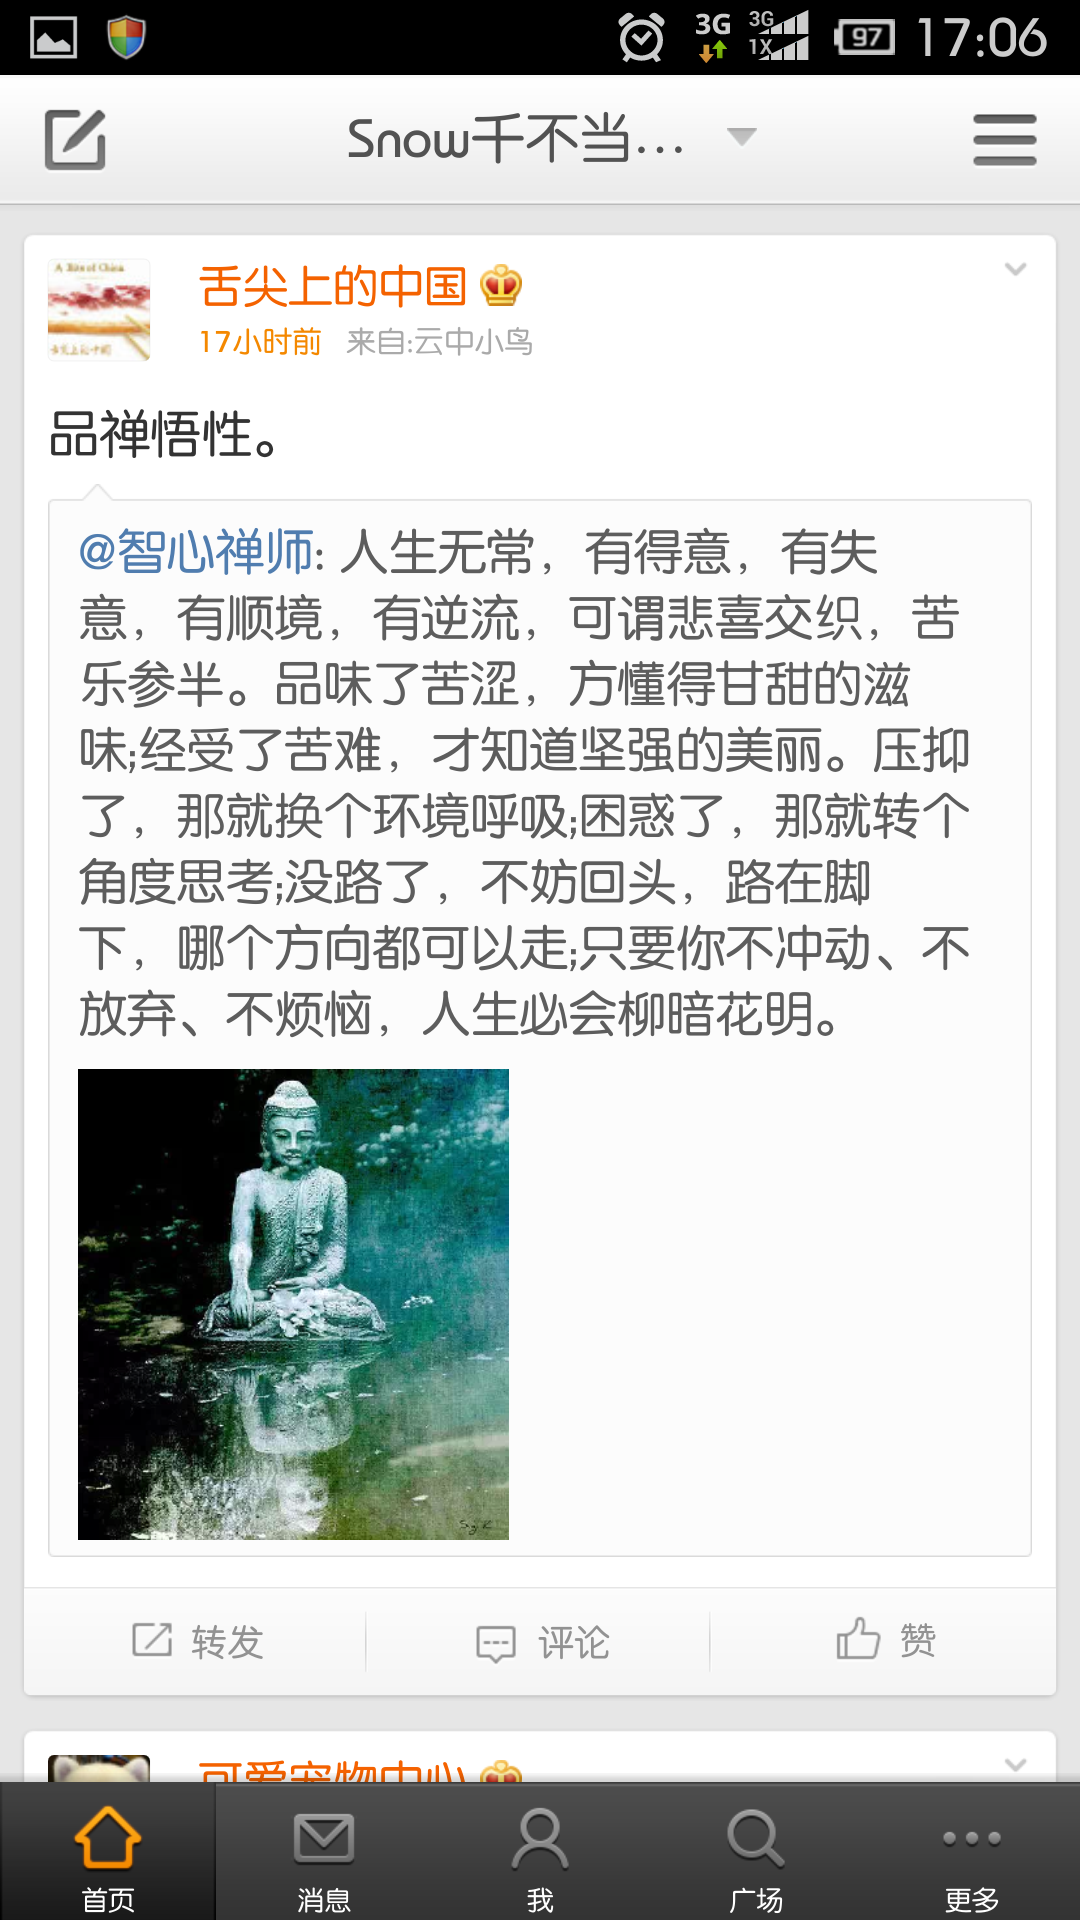 Screenshot_2013-11-05-17-06-18.png